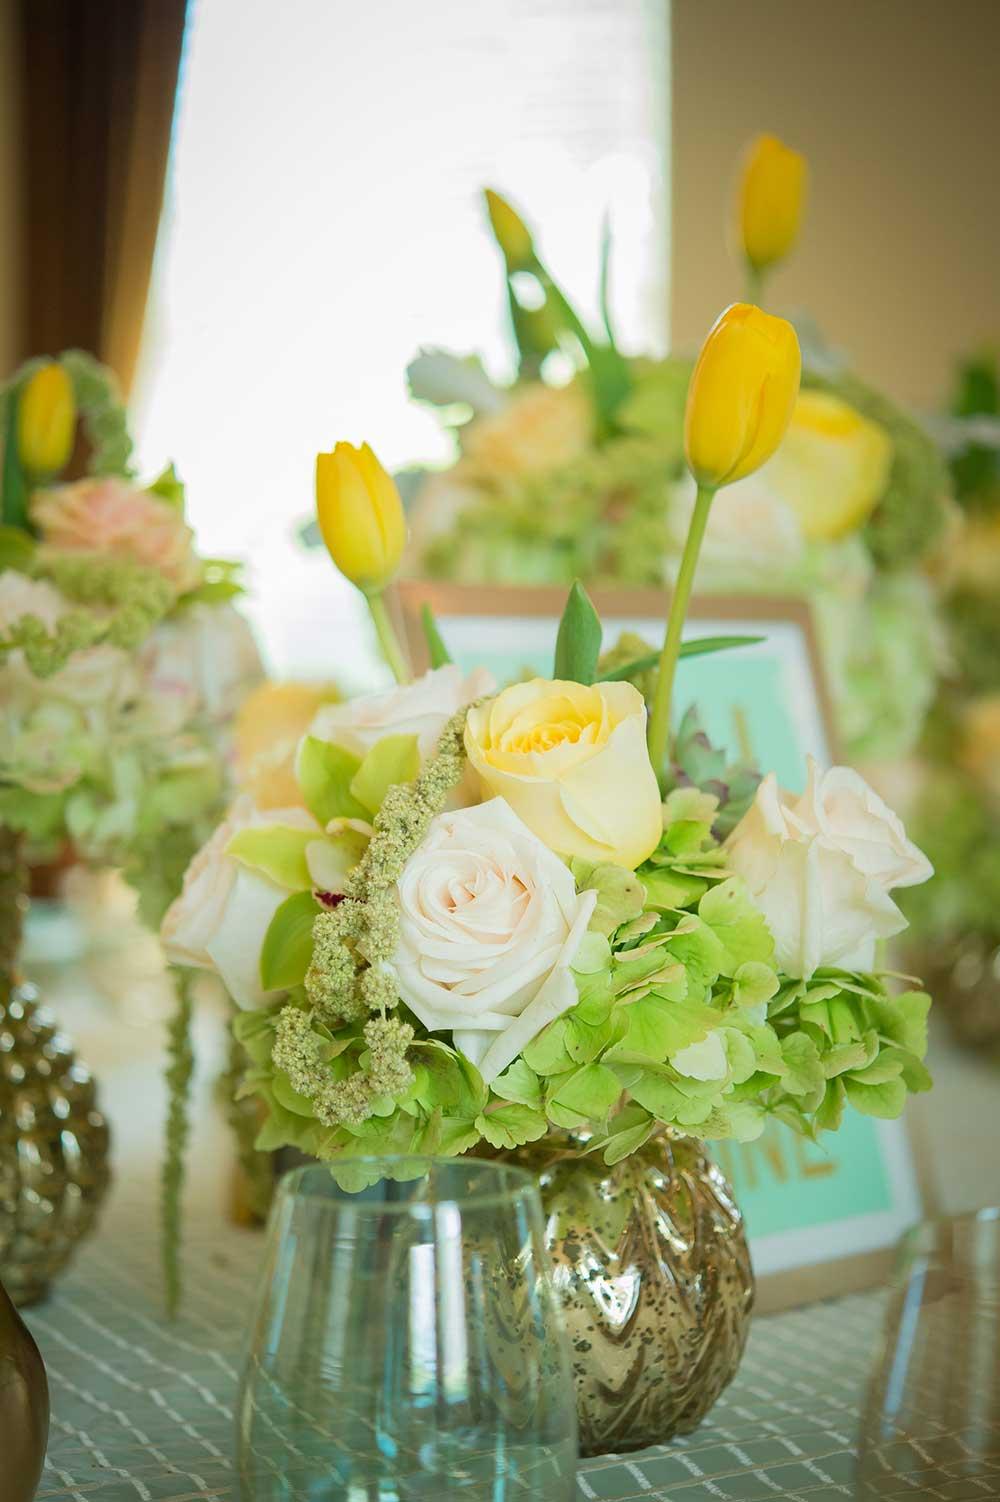 Rose-Tulip-and-Green-Hydrangea-Arrangement-in-Mercury-Glass-Bud-Vase